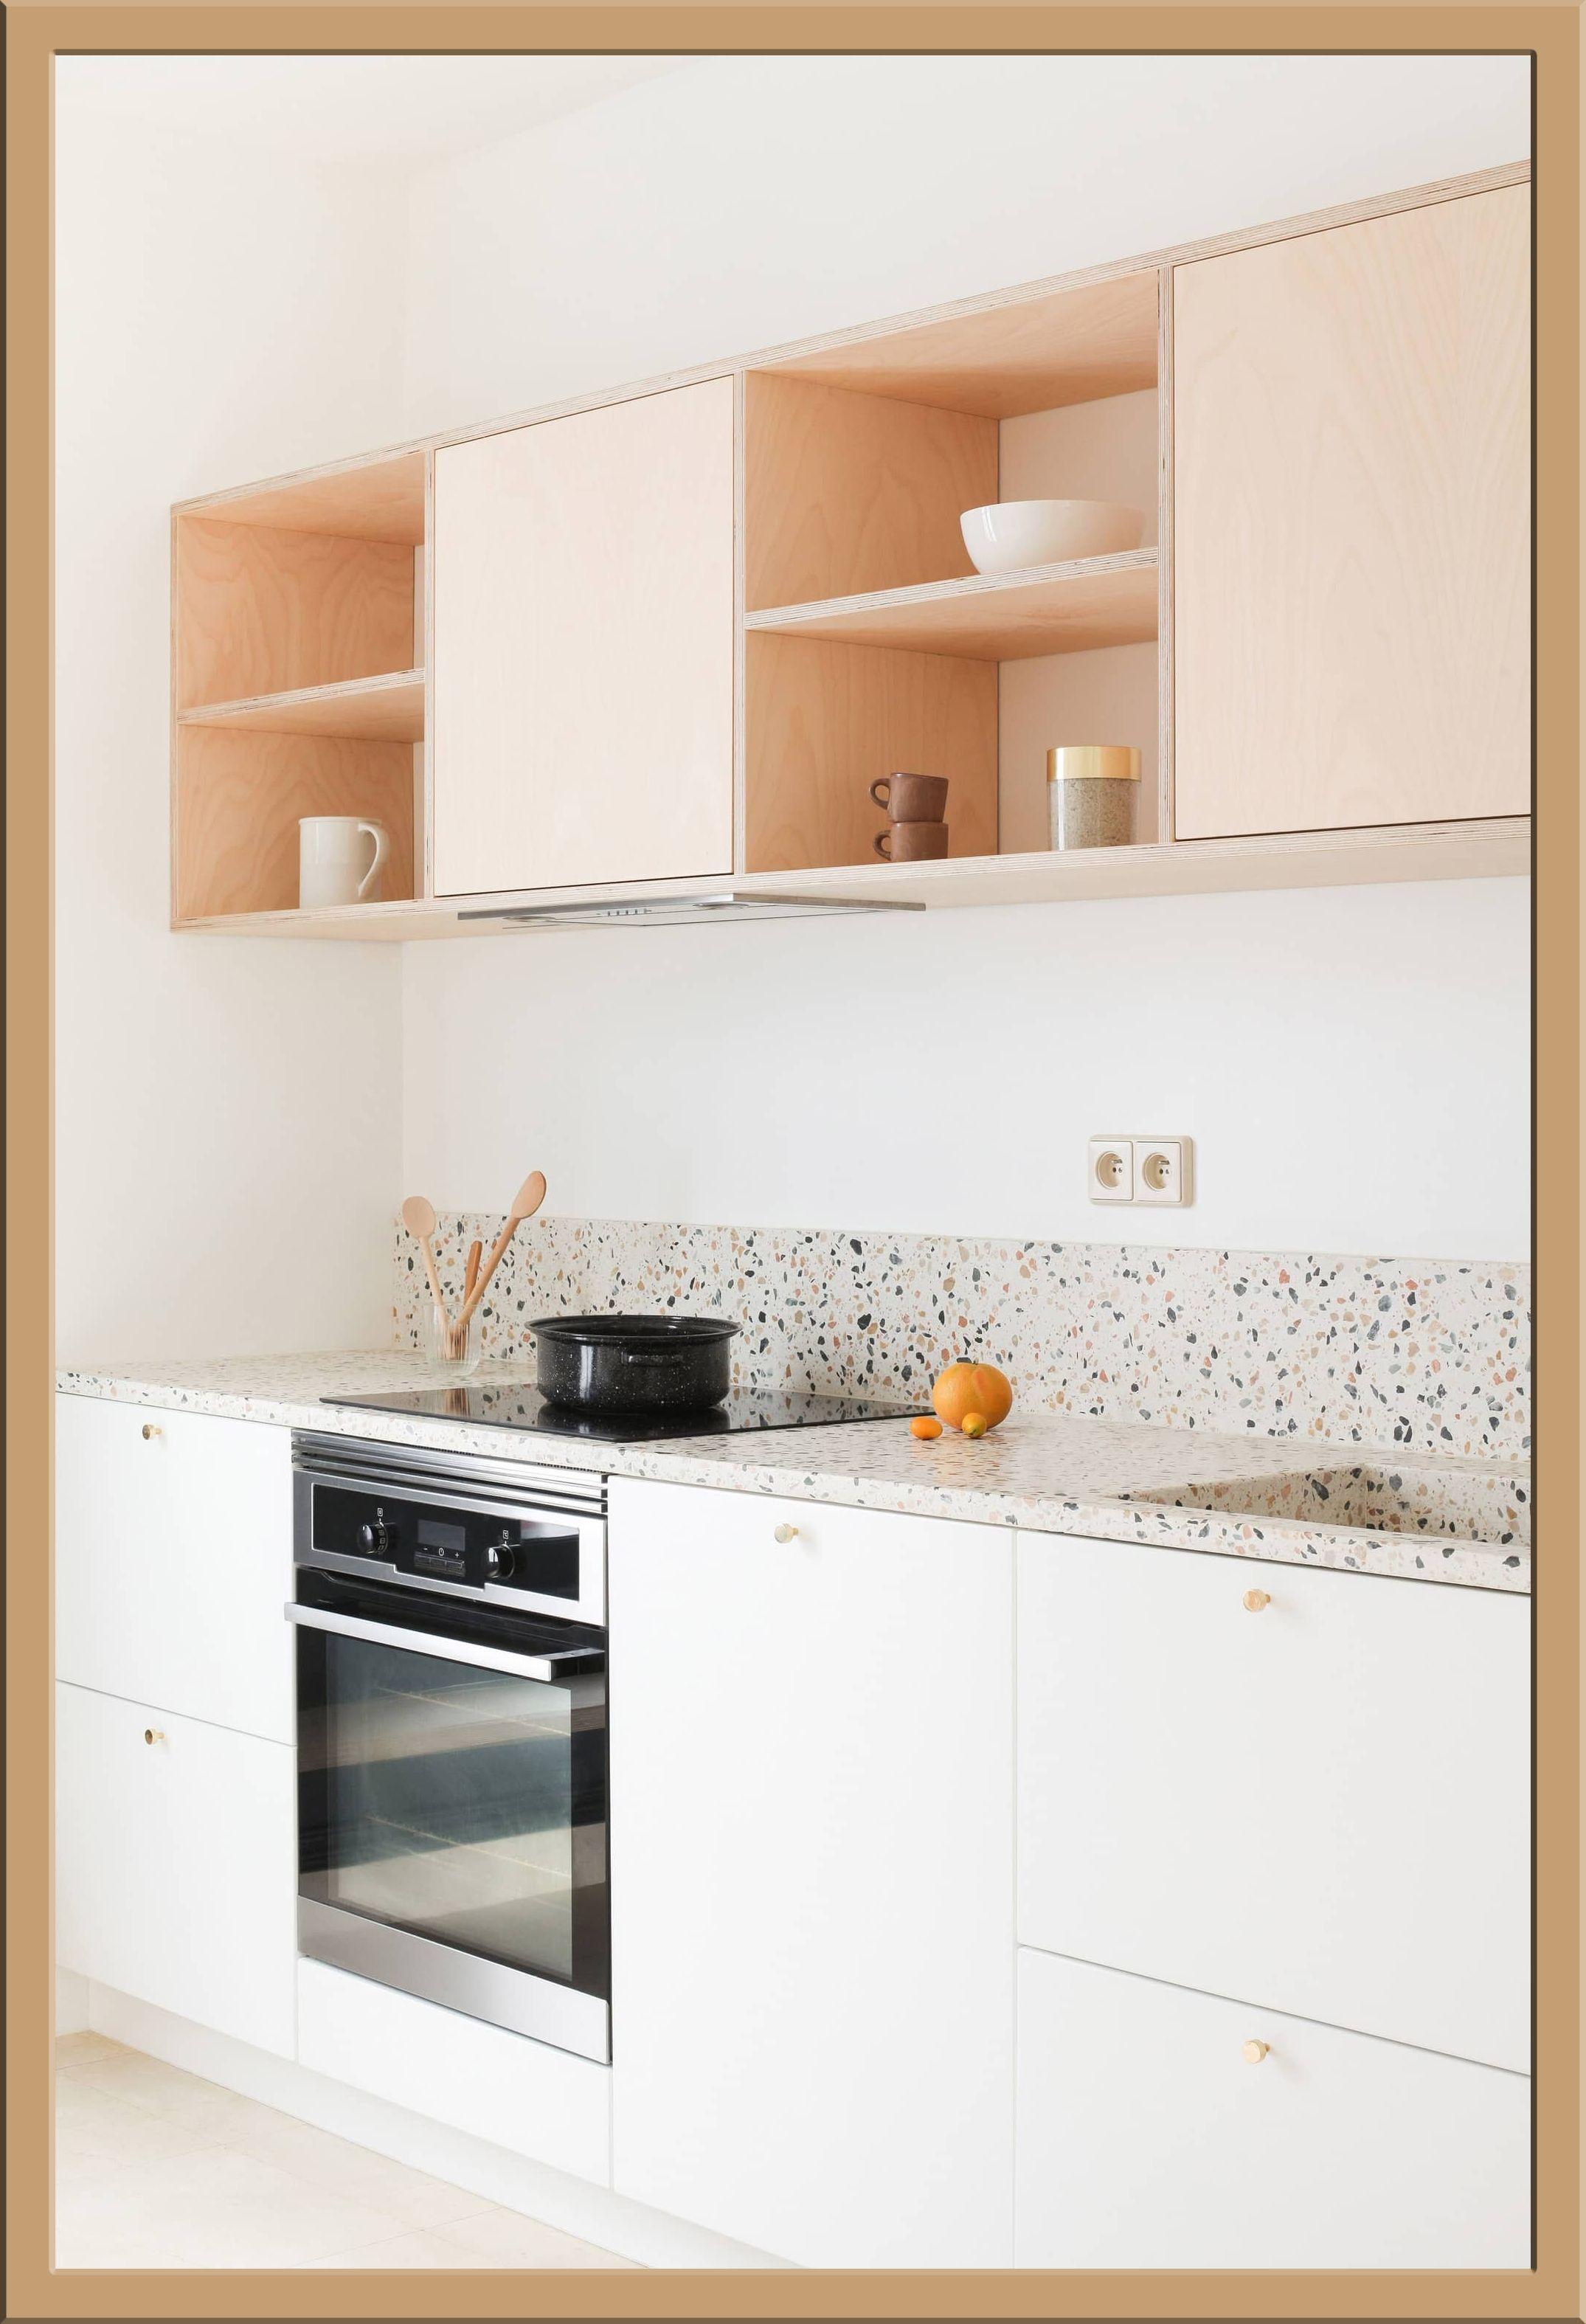 100 Ways To Improve Kitchen Decor